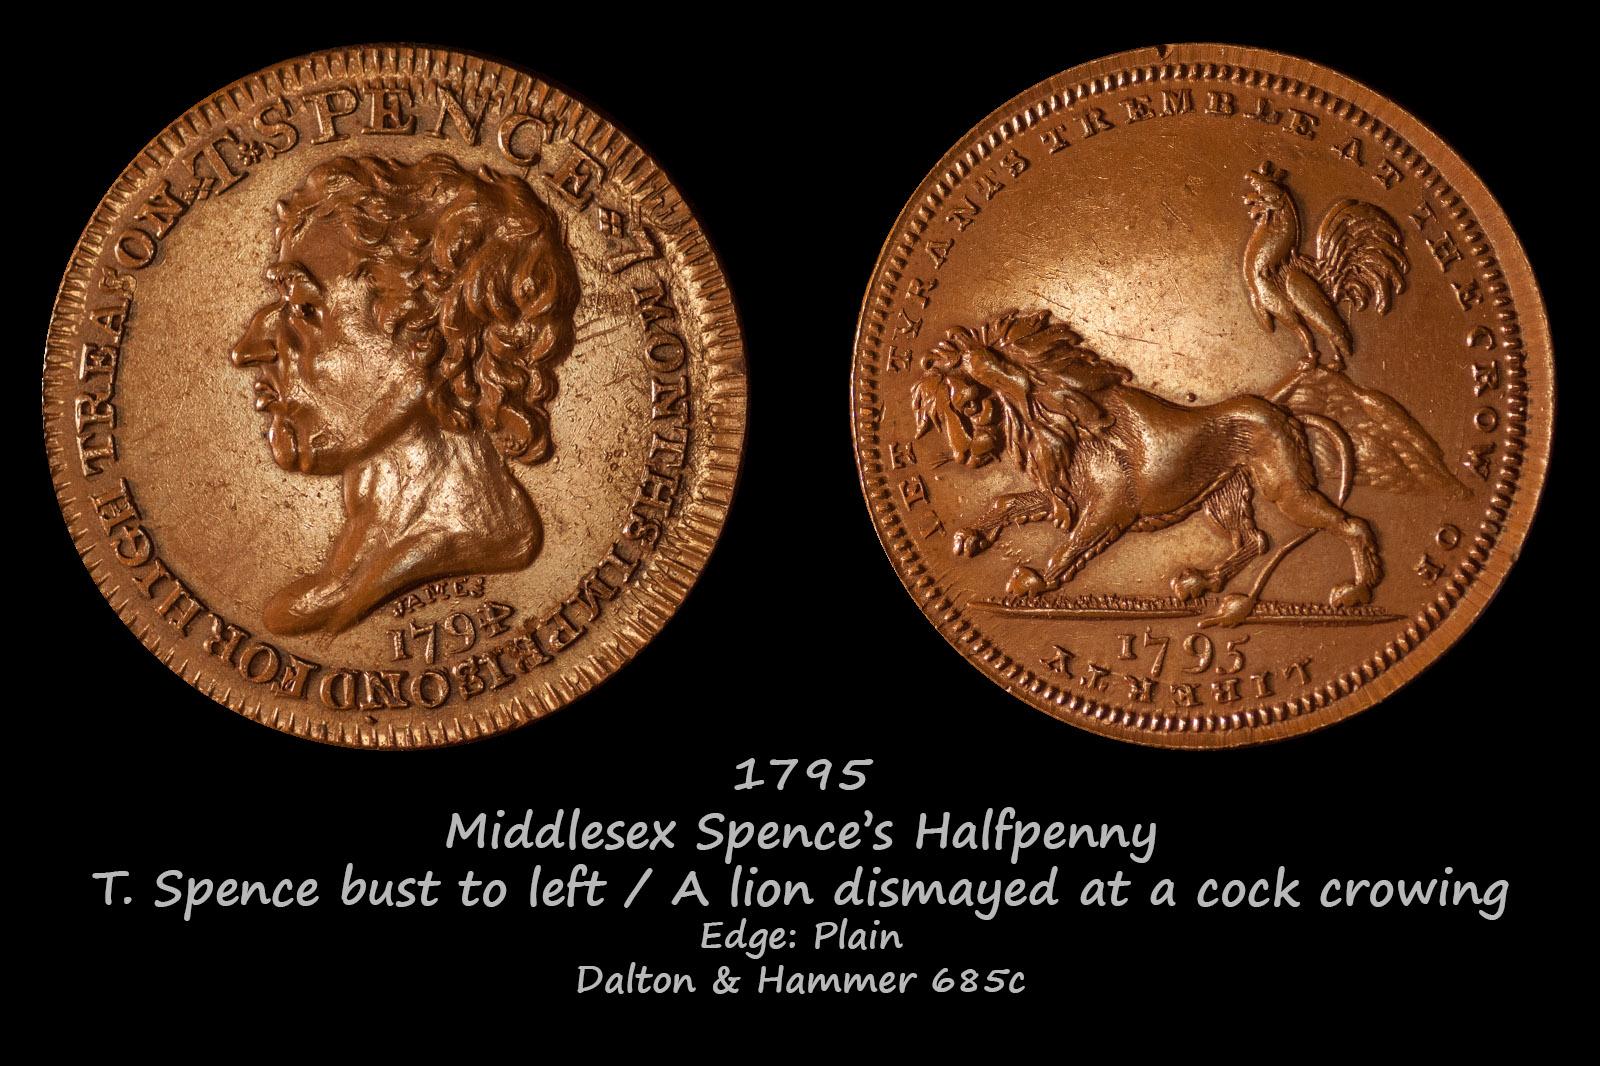 Spence's Halfpenny D&H685c